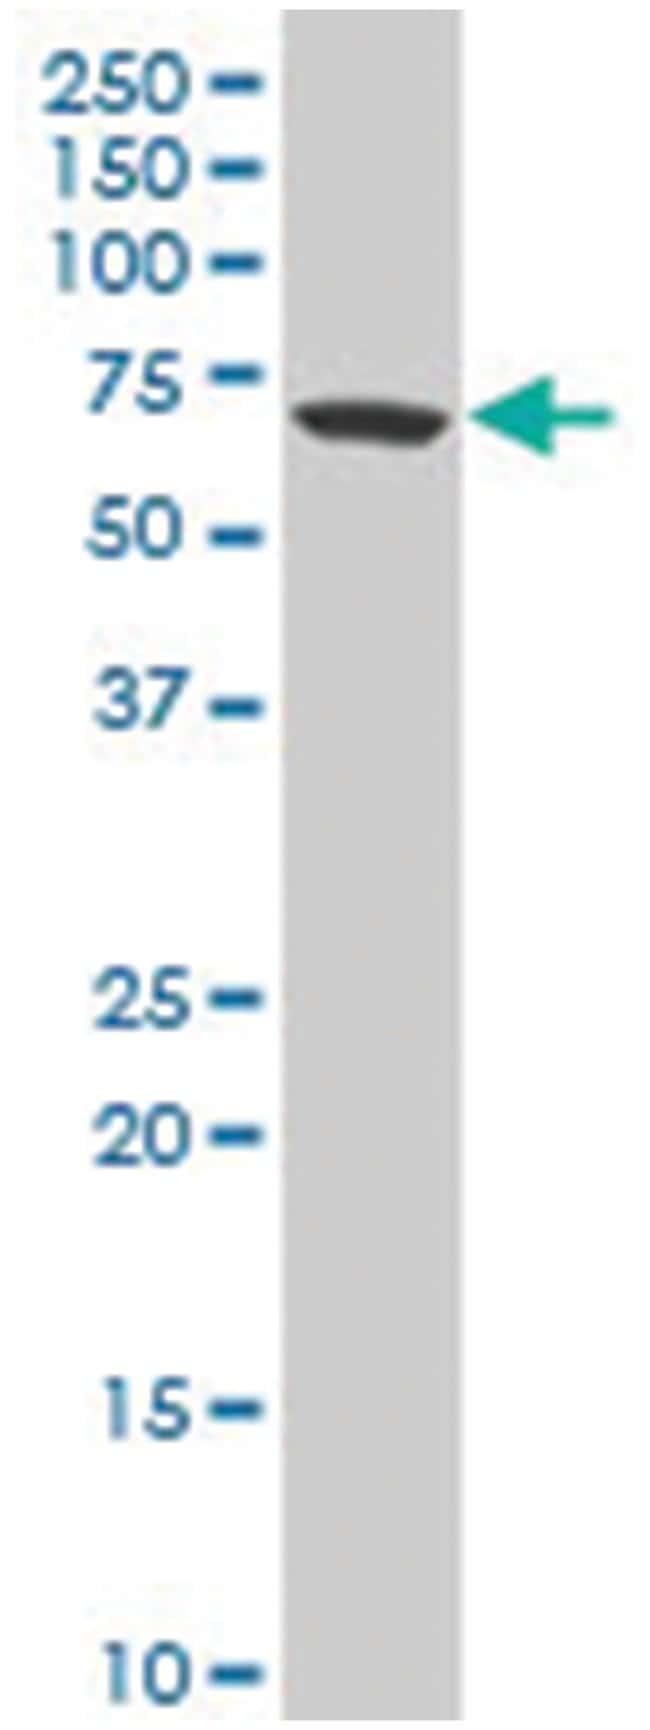 zinc finger protein 169 (A01), Mouse anti-Human, Polyclonal Antibody, Abnova